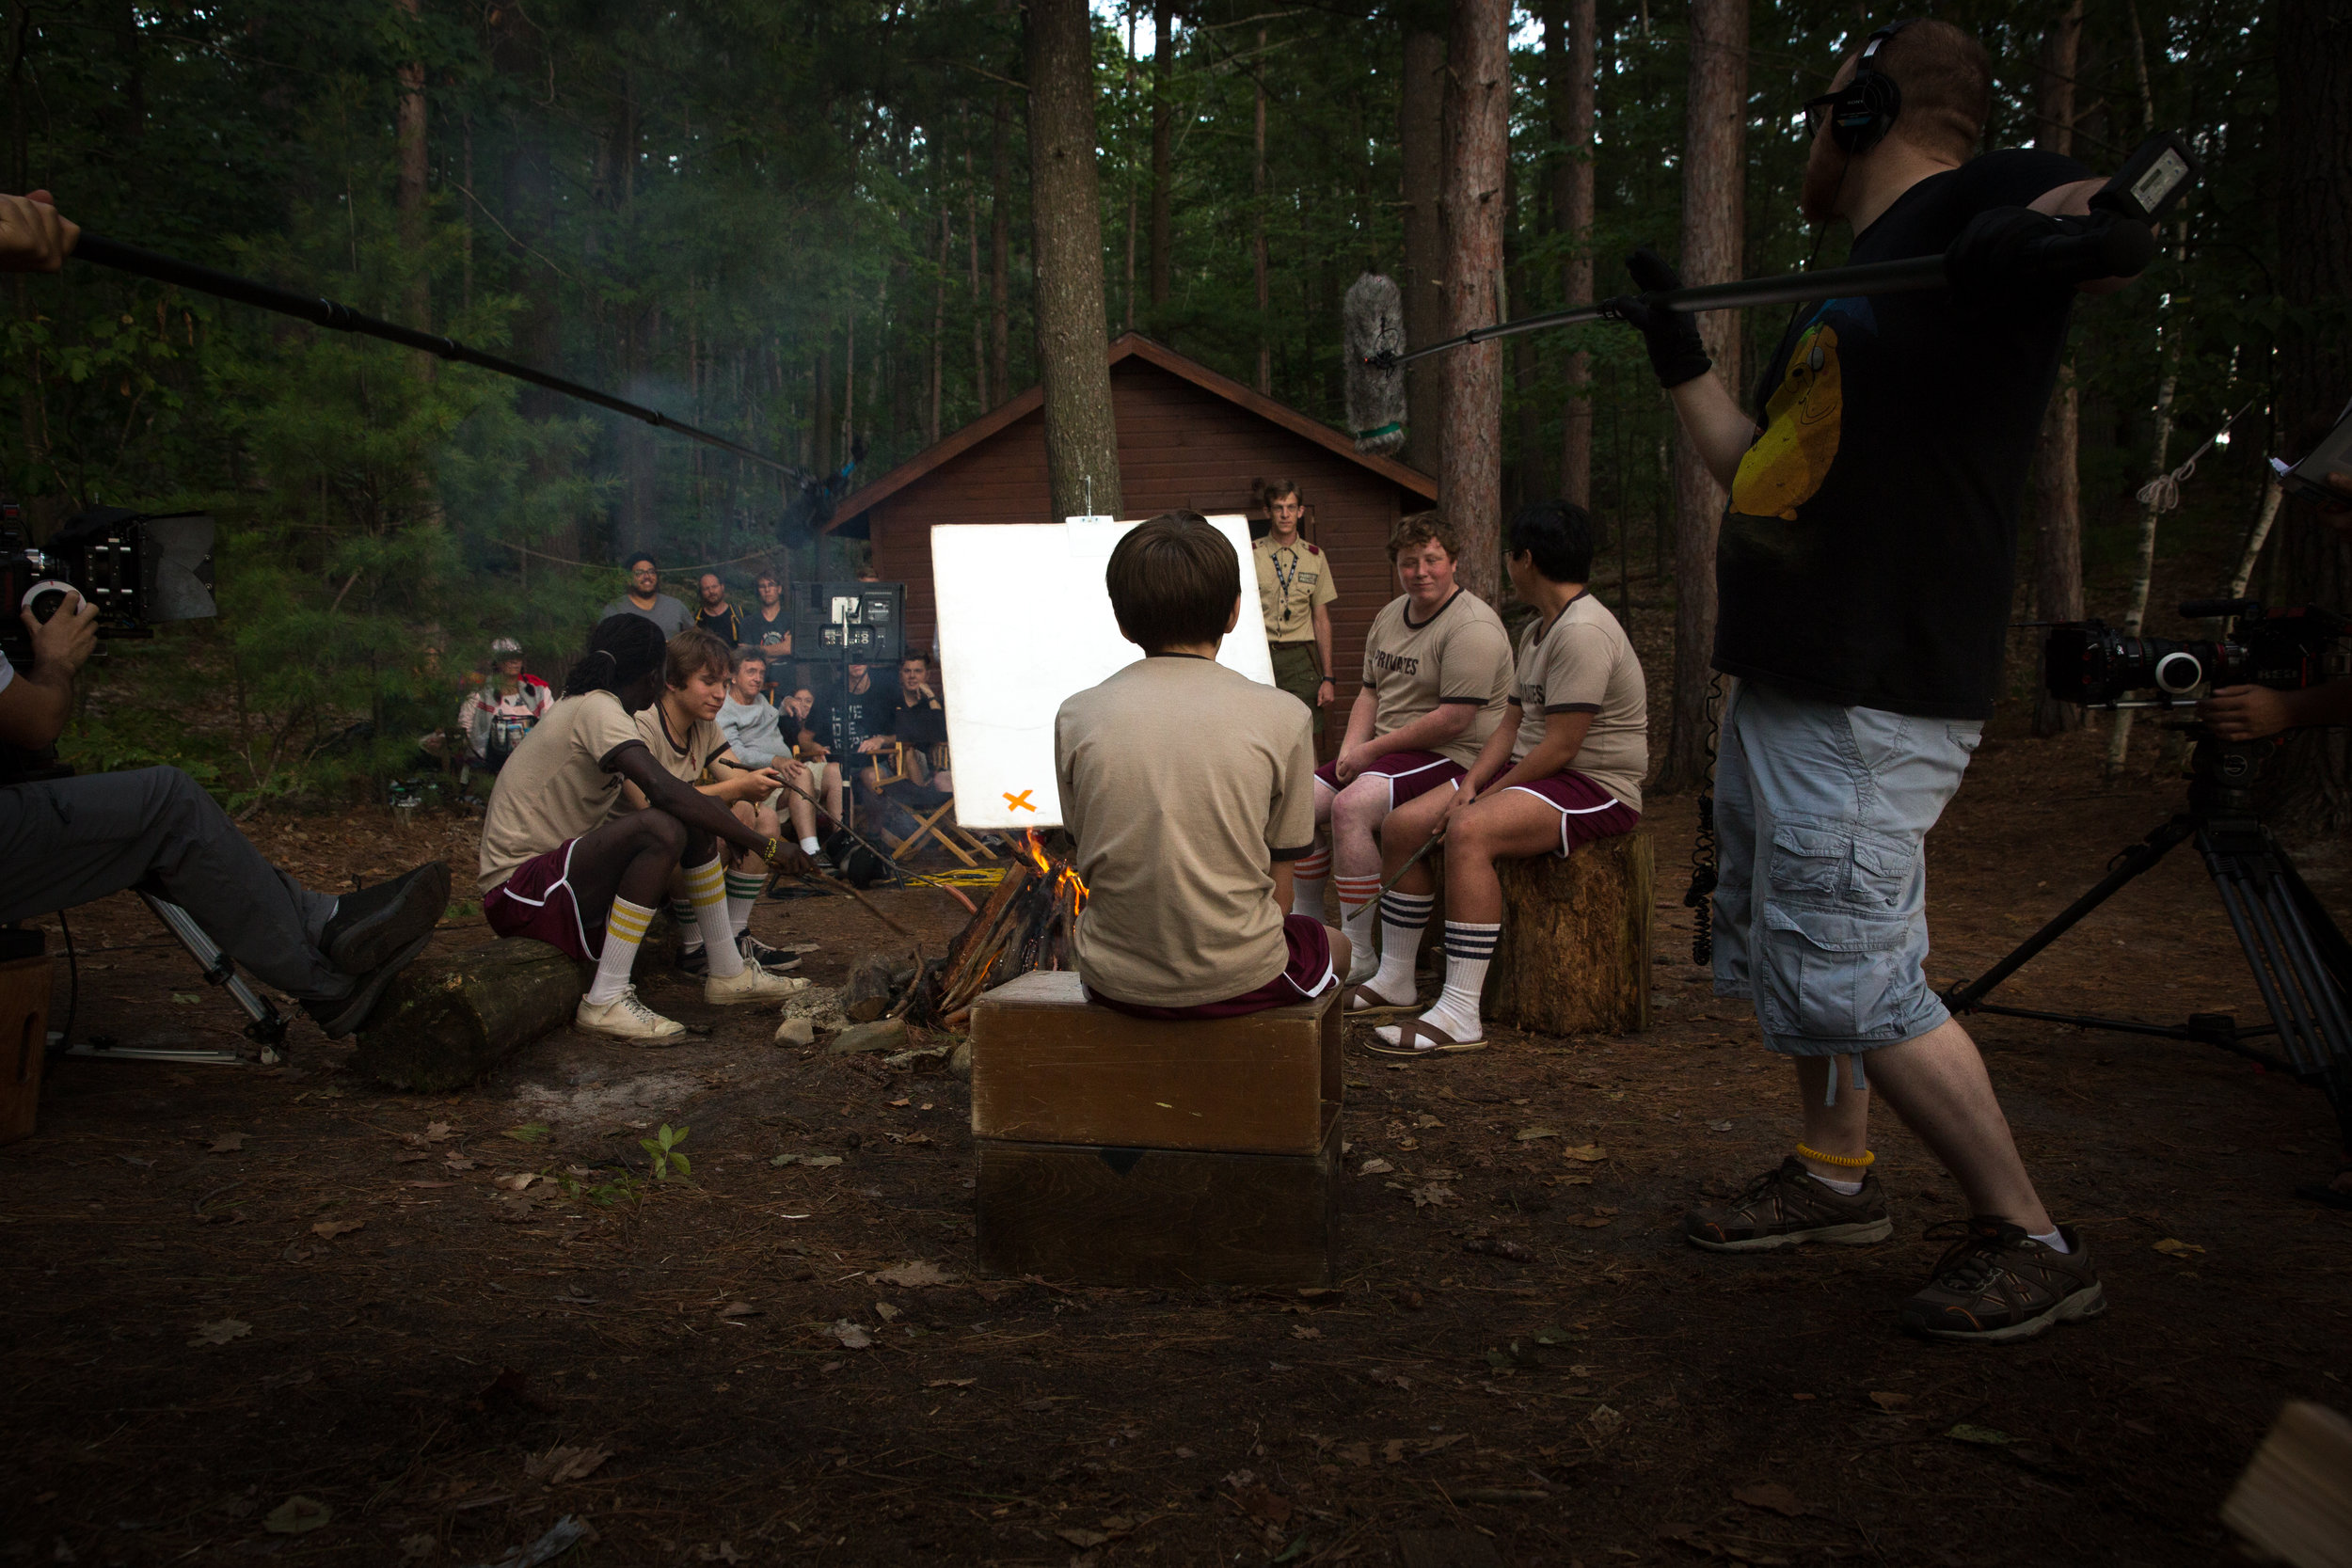 Camp_Manna_BTS_02.jpg